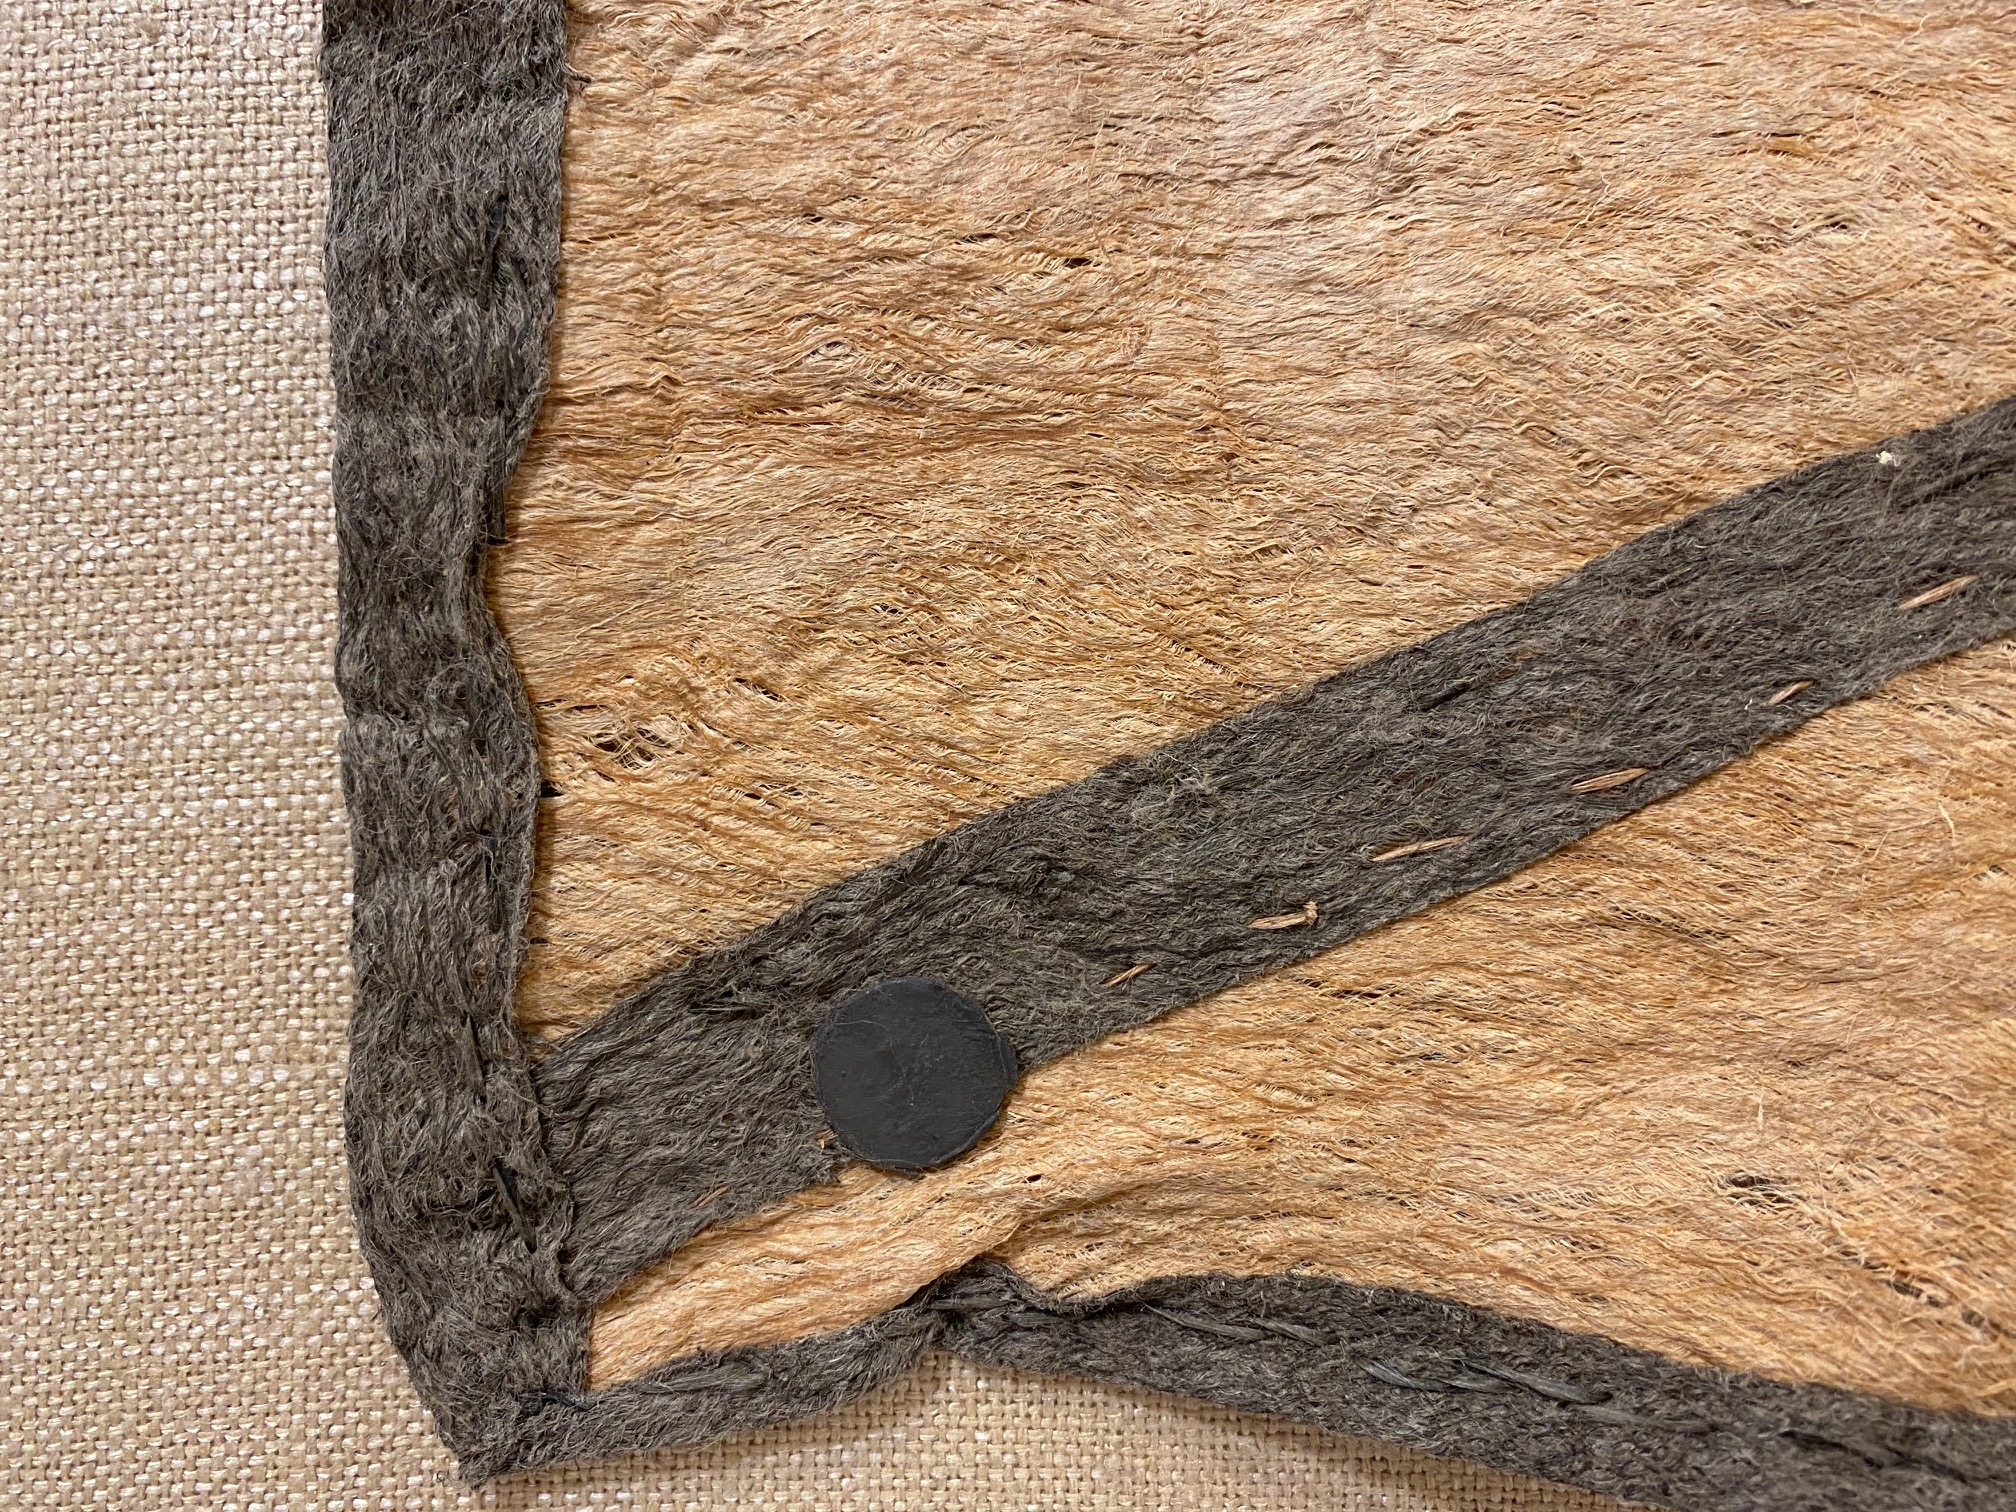 Tapa (Bark Cloth, Nioge), mounted with magnets